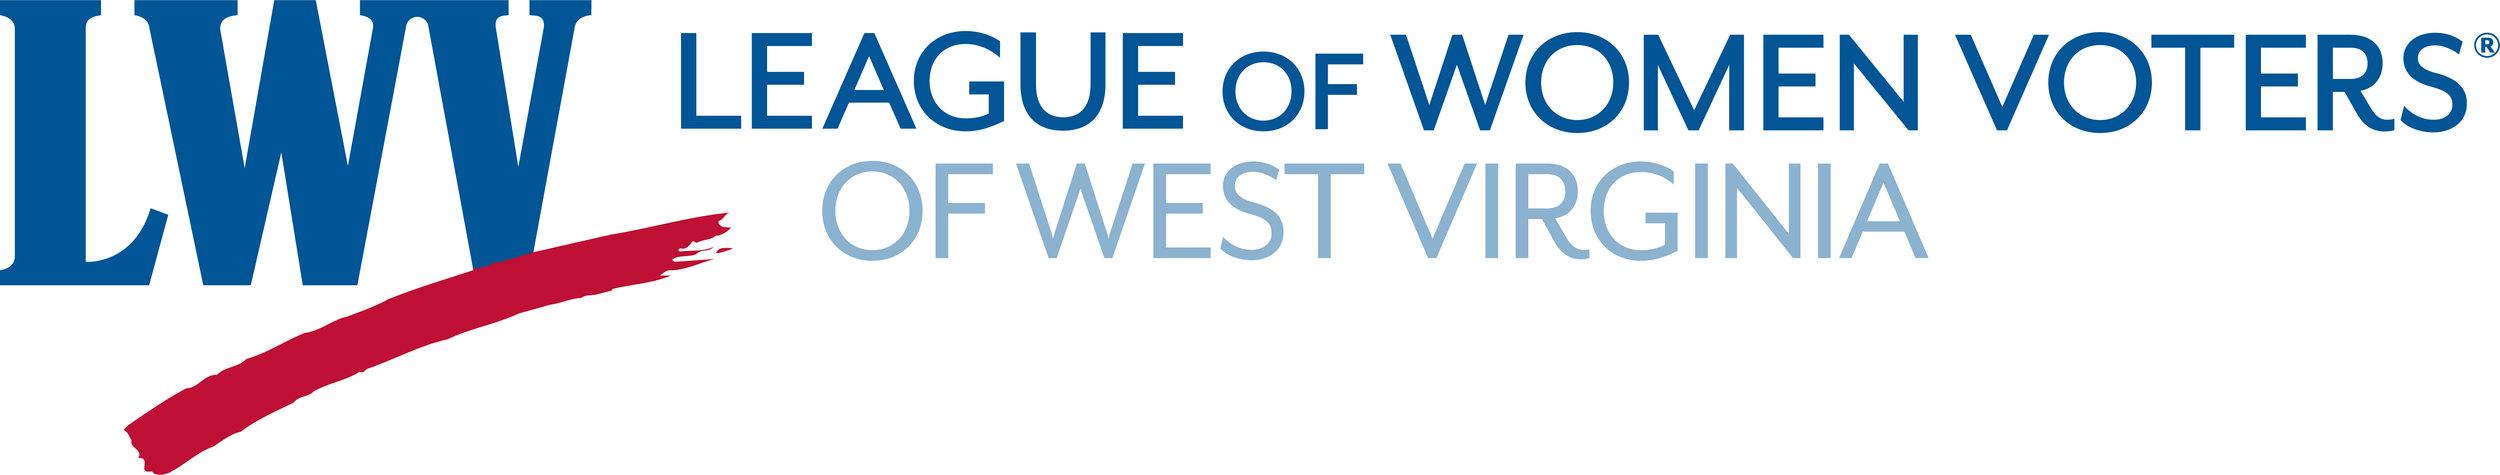 League of Women Voters of West Virginia.jpg